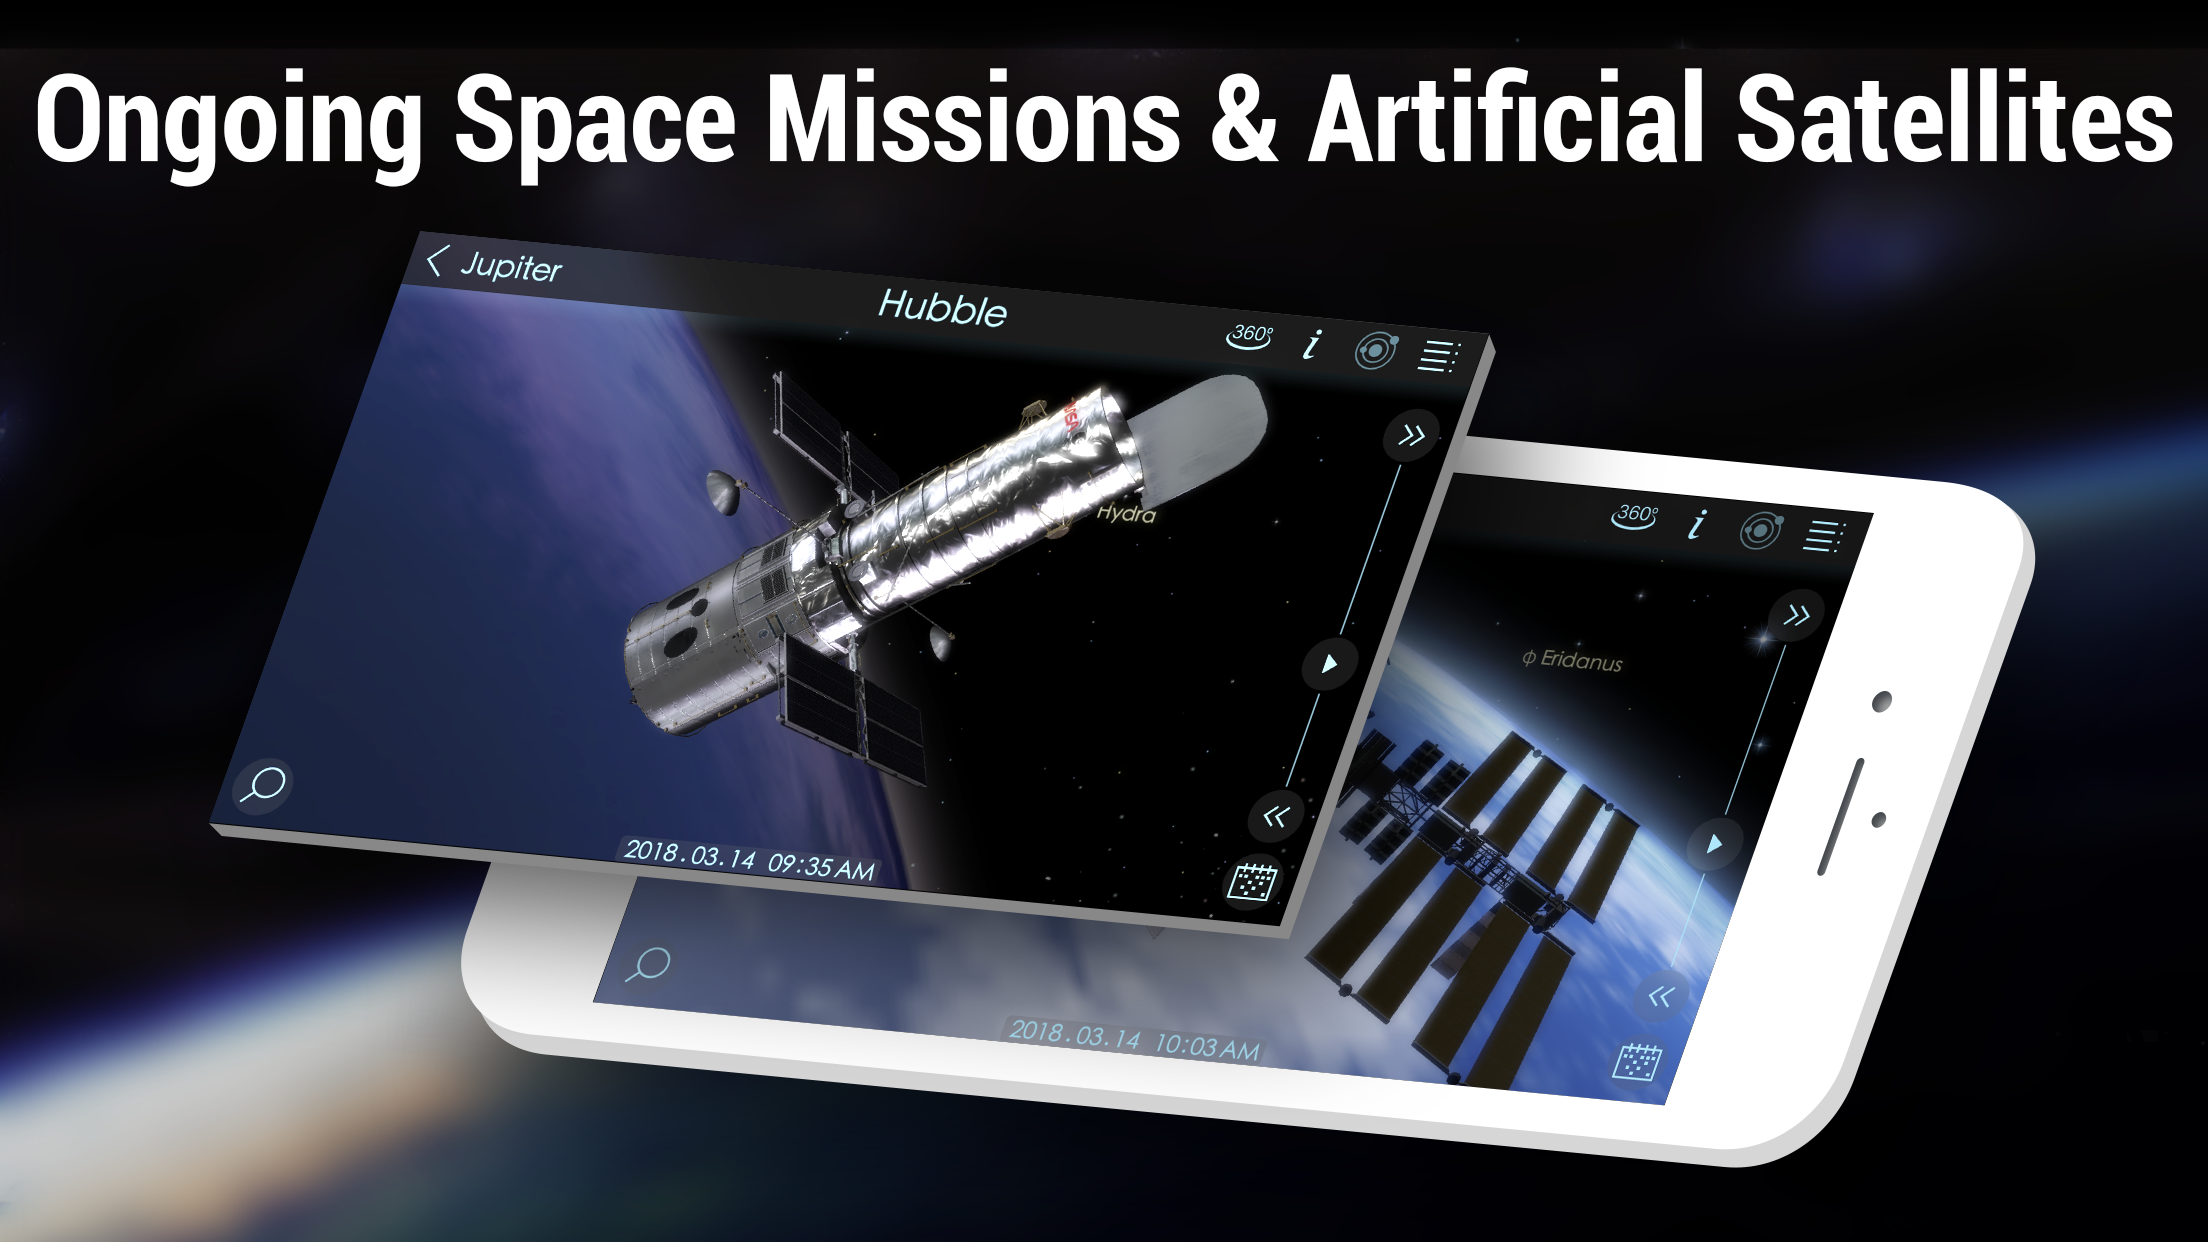 Solar Walk 2 - Space Simulator Screenshot